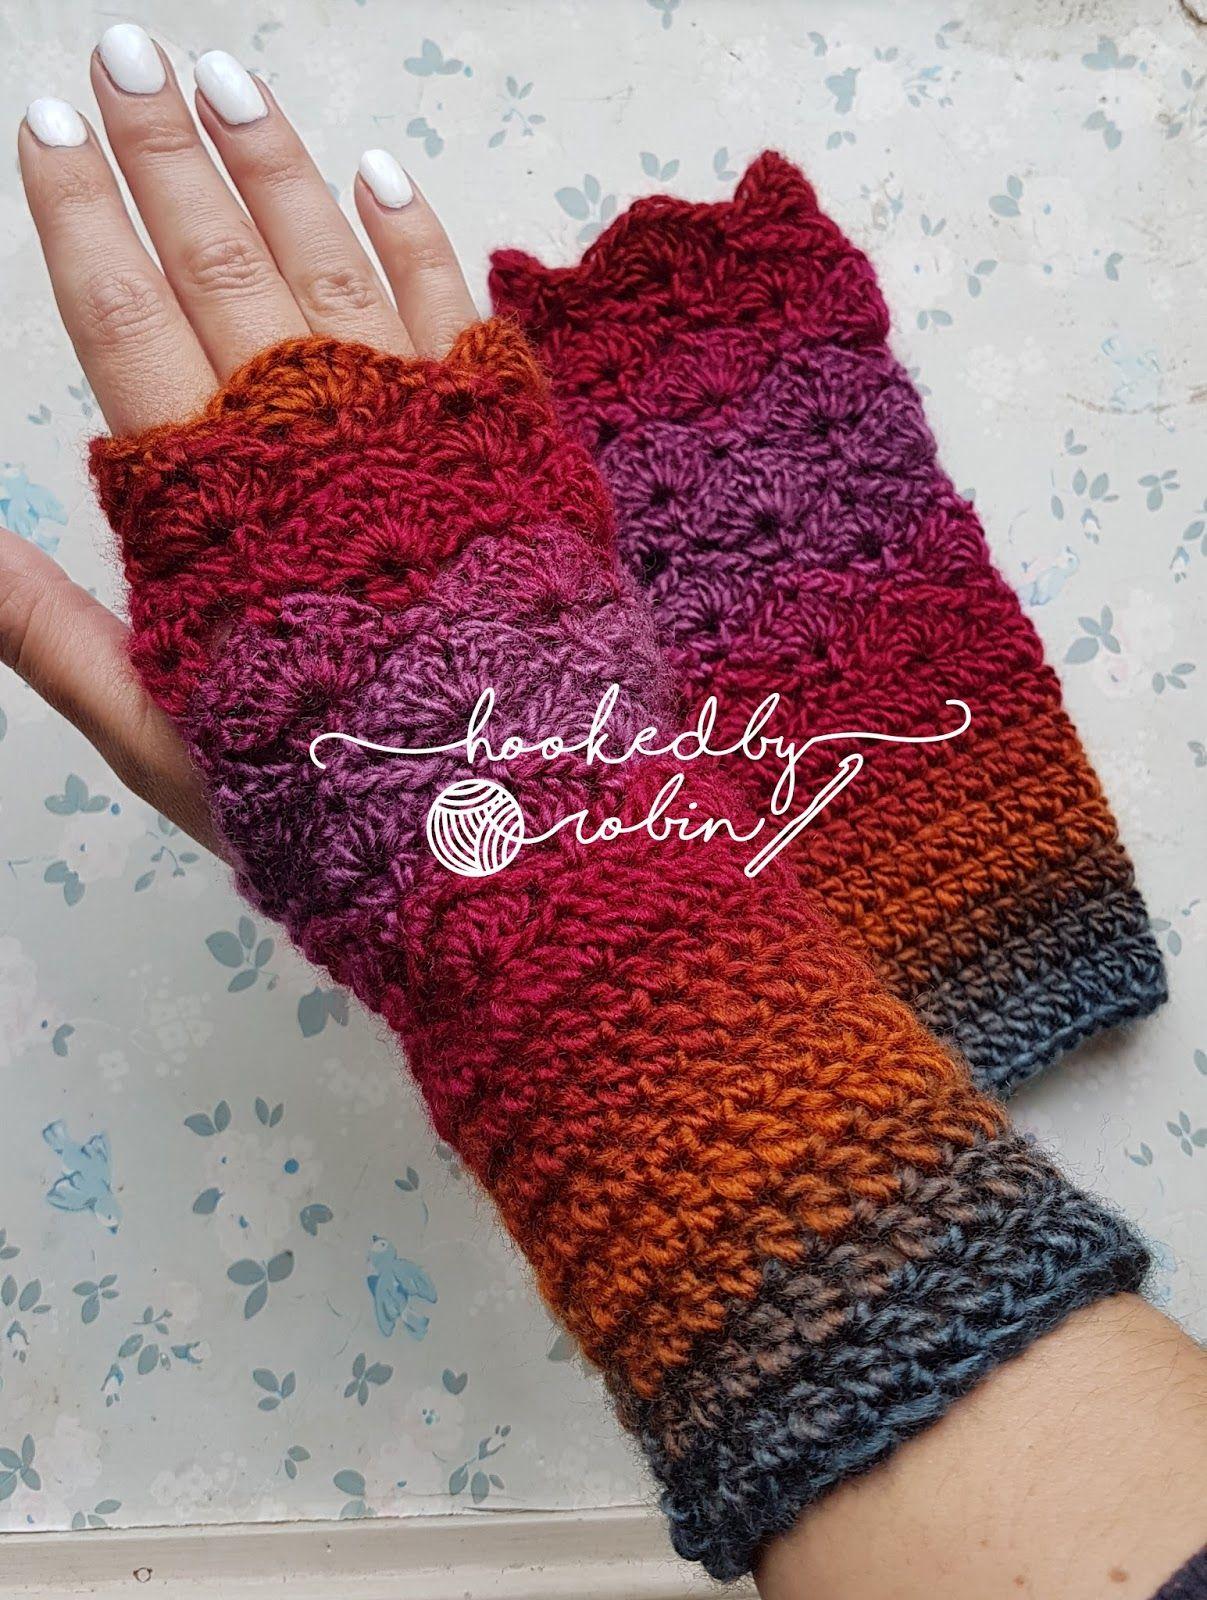 25 Crochet Fingerless Gloves Wrist Warmer Free Patterns Crochet